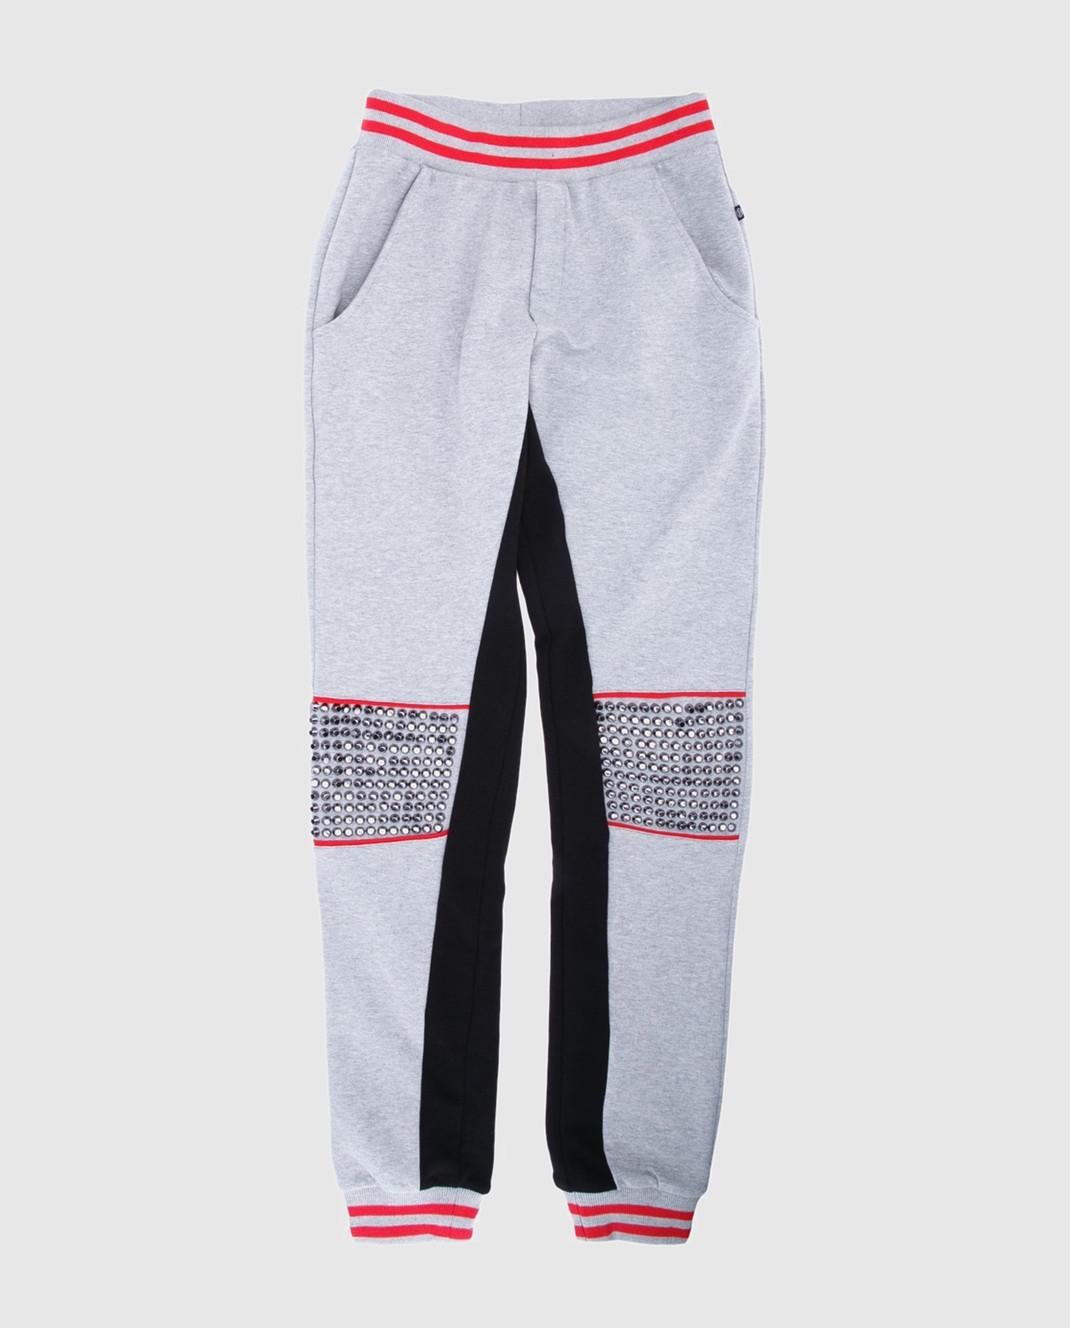 Philipp Plein Детские серые спортивные брюки BJT00591416